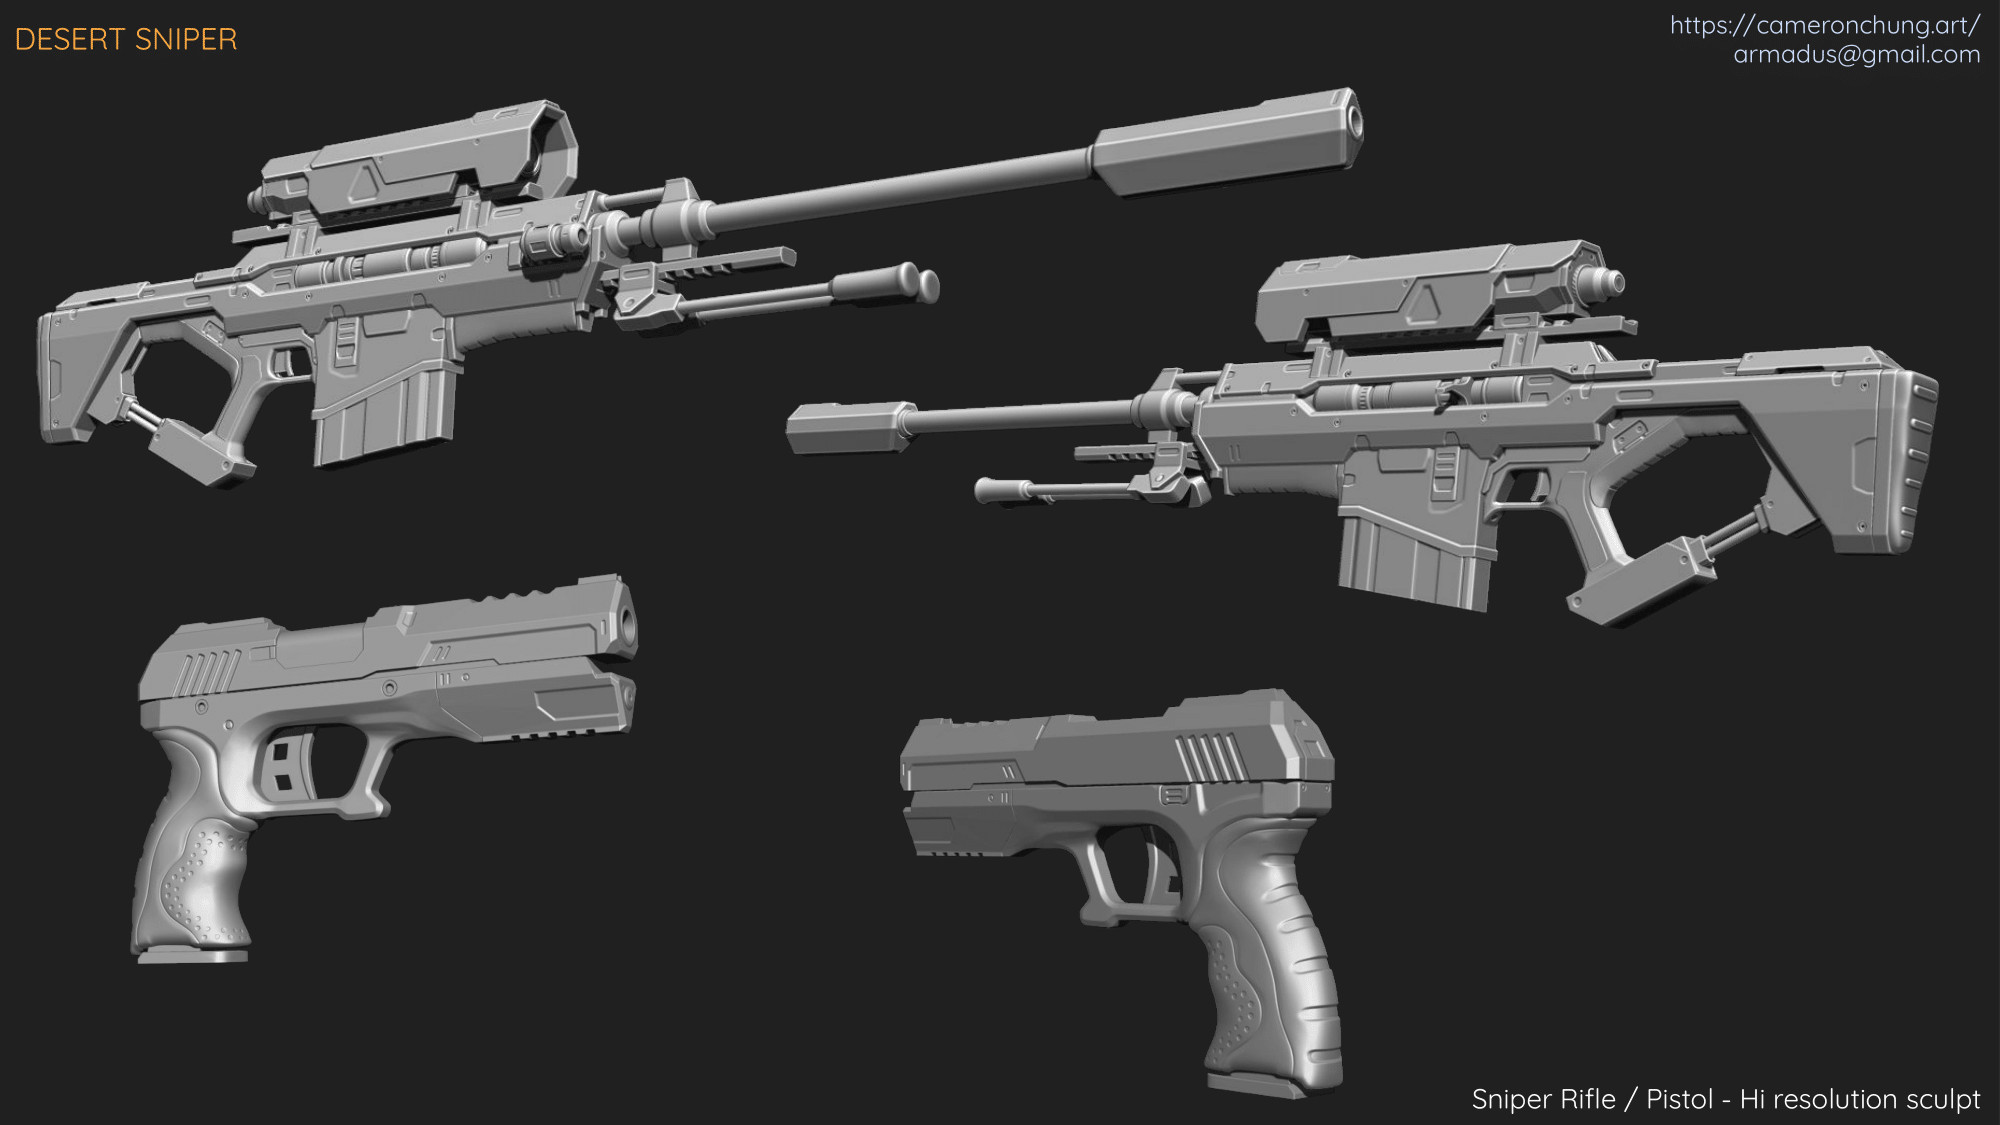 Sniper Rifle / Pistol - Zbrush - Hi resolution Sculpt